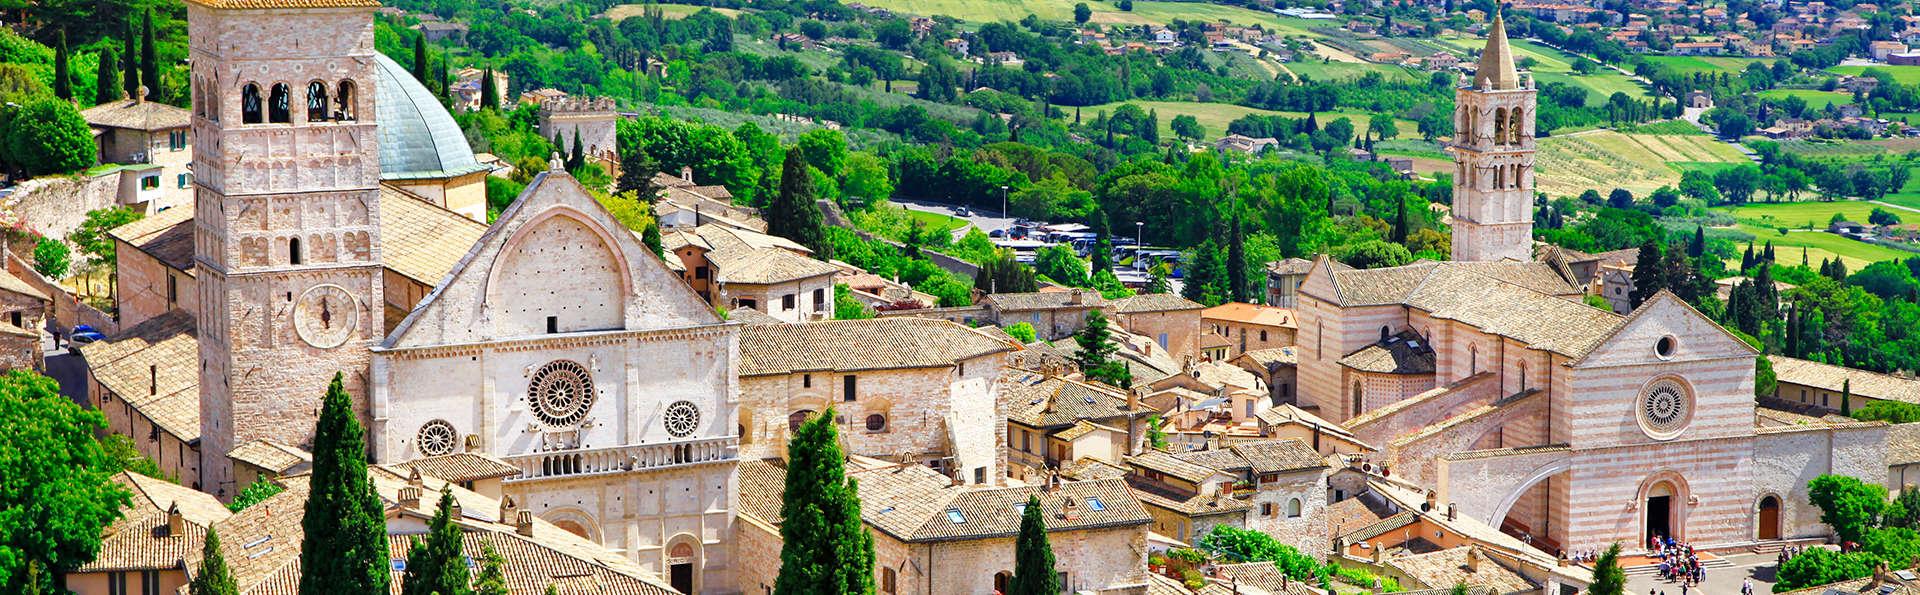 Le Silve di Armenzano - Residenza d'Epoca - Edit_Assisi2.jpg